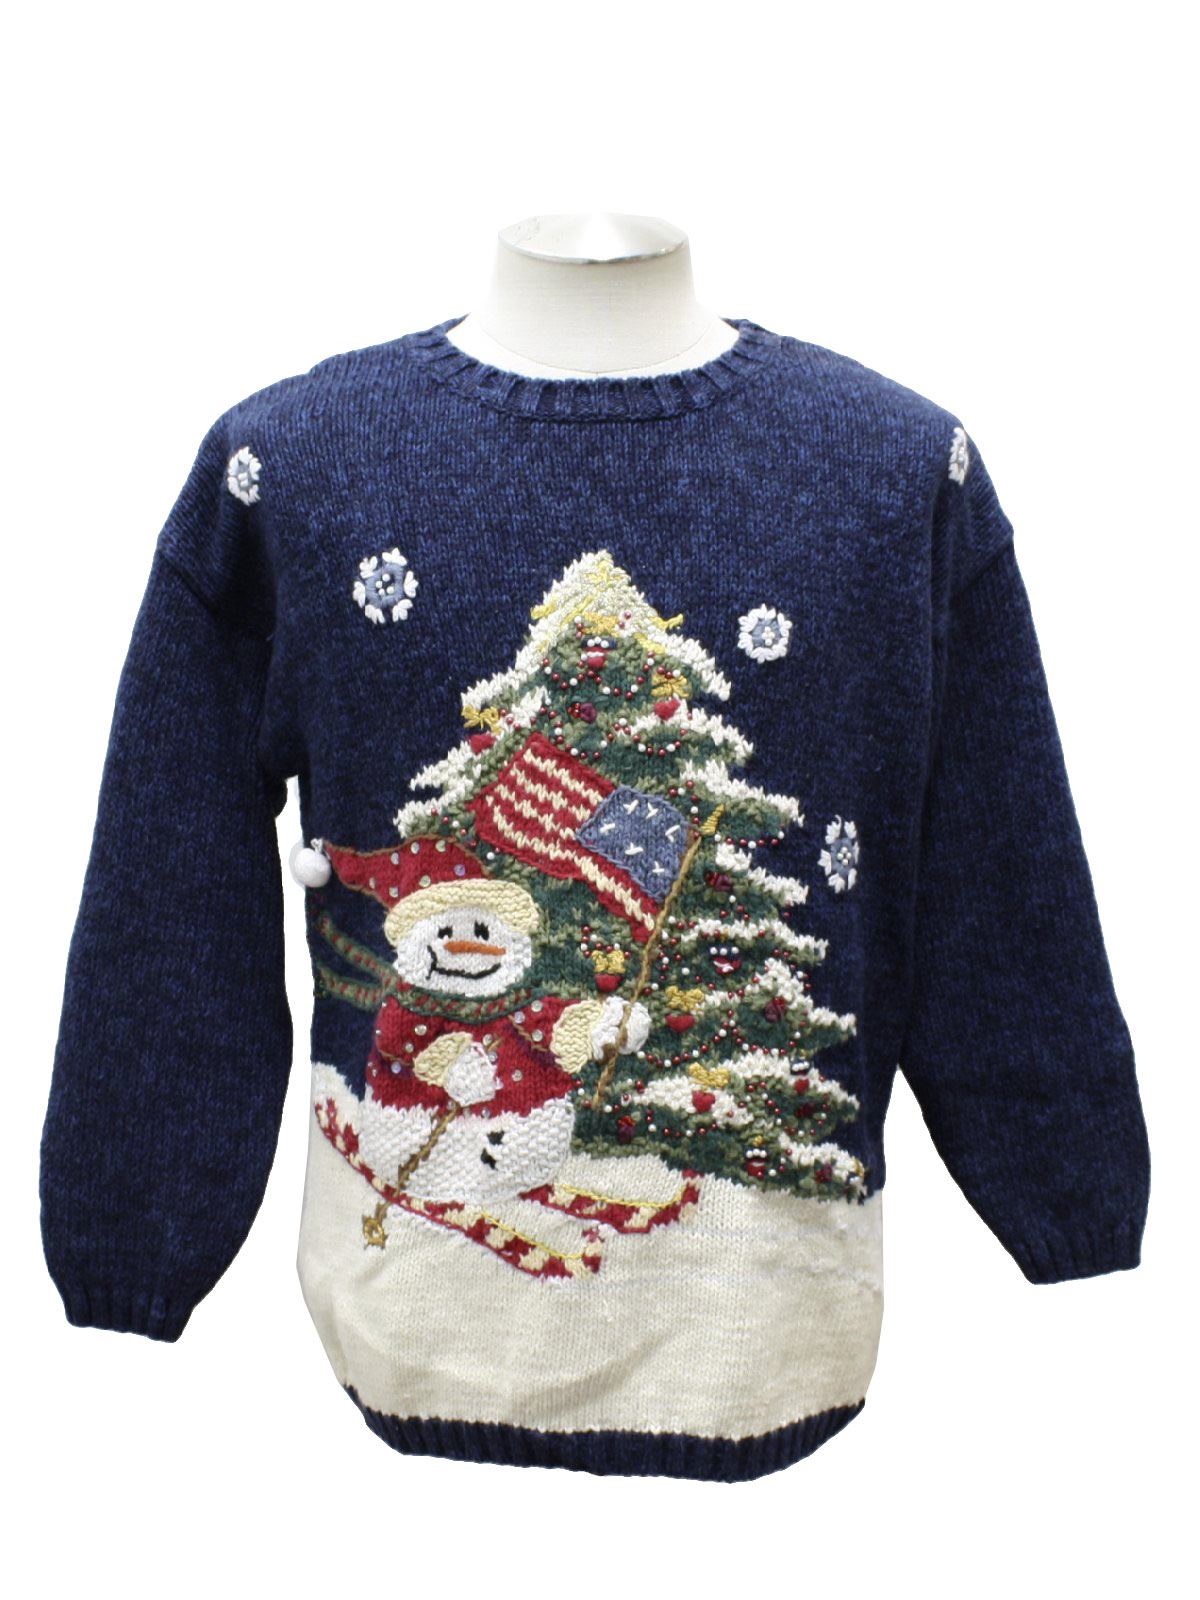 Fashion Bug Unisex Patriotic Santa Ugly Christmas Sweater